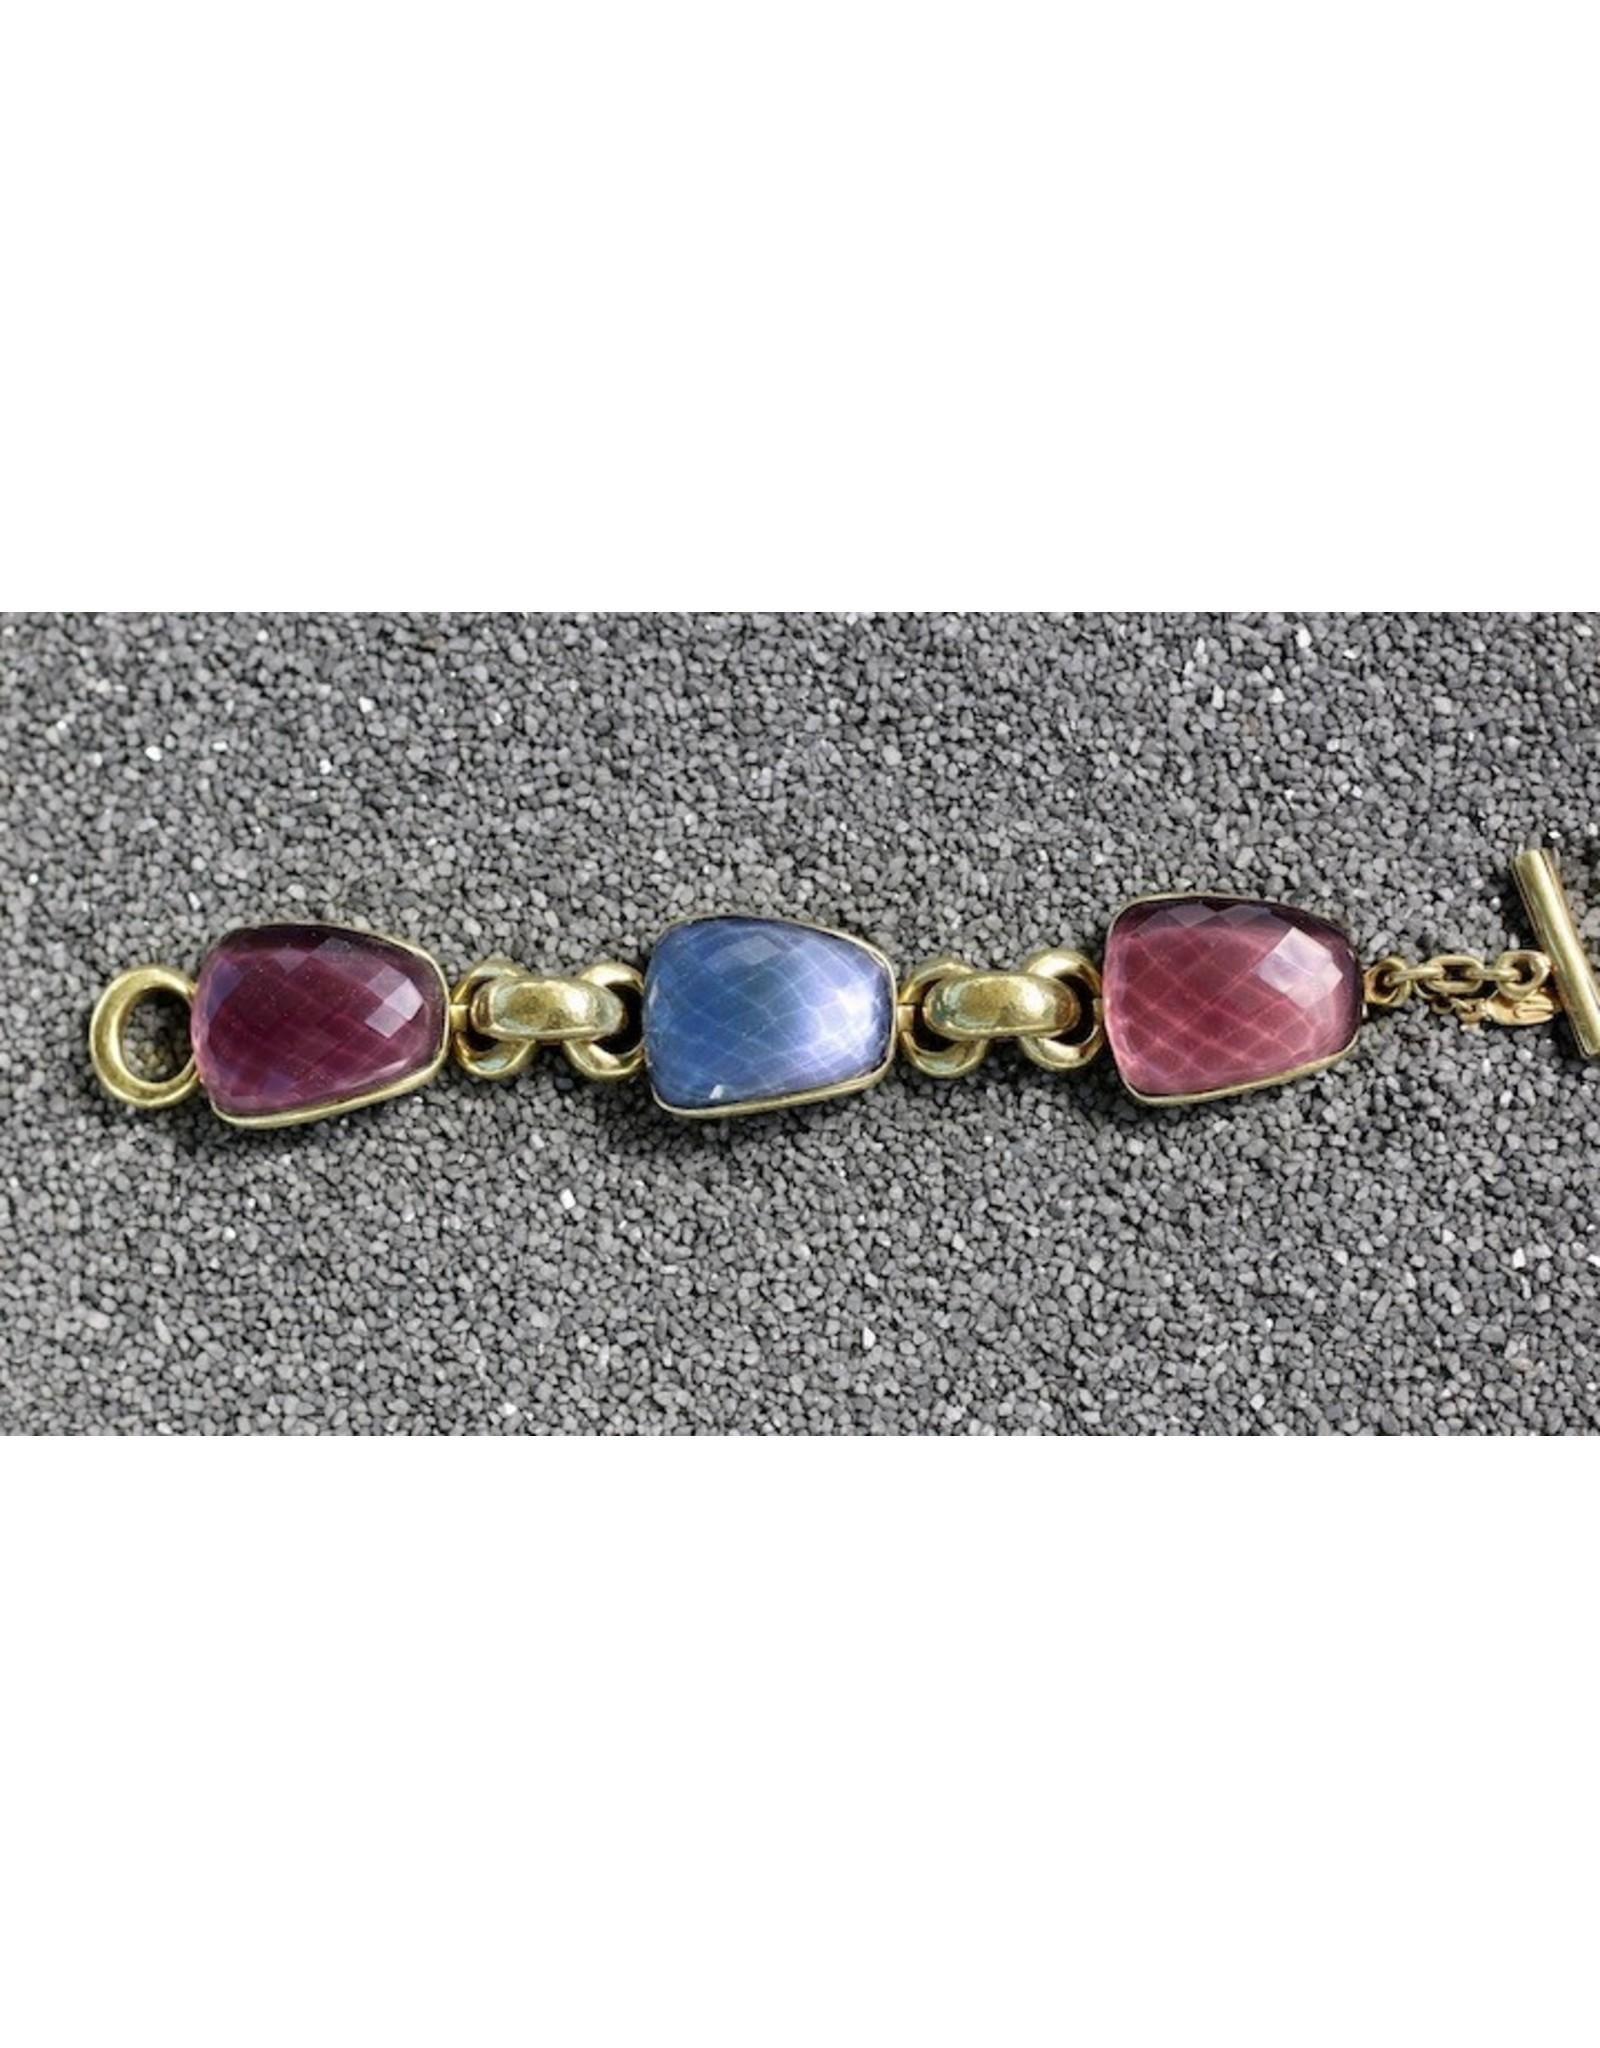 Vaubel Vaubel: Vermeil with Semi Precious Stones